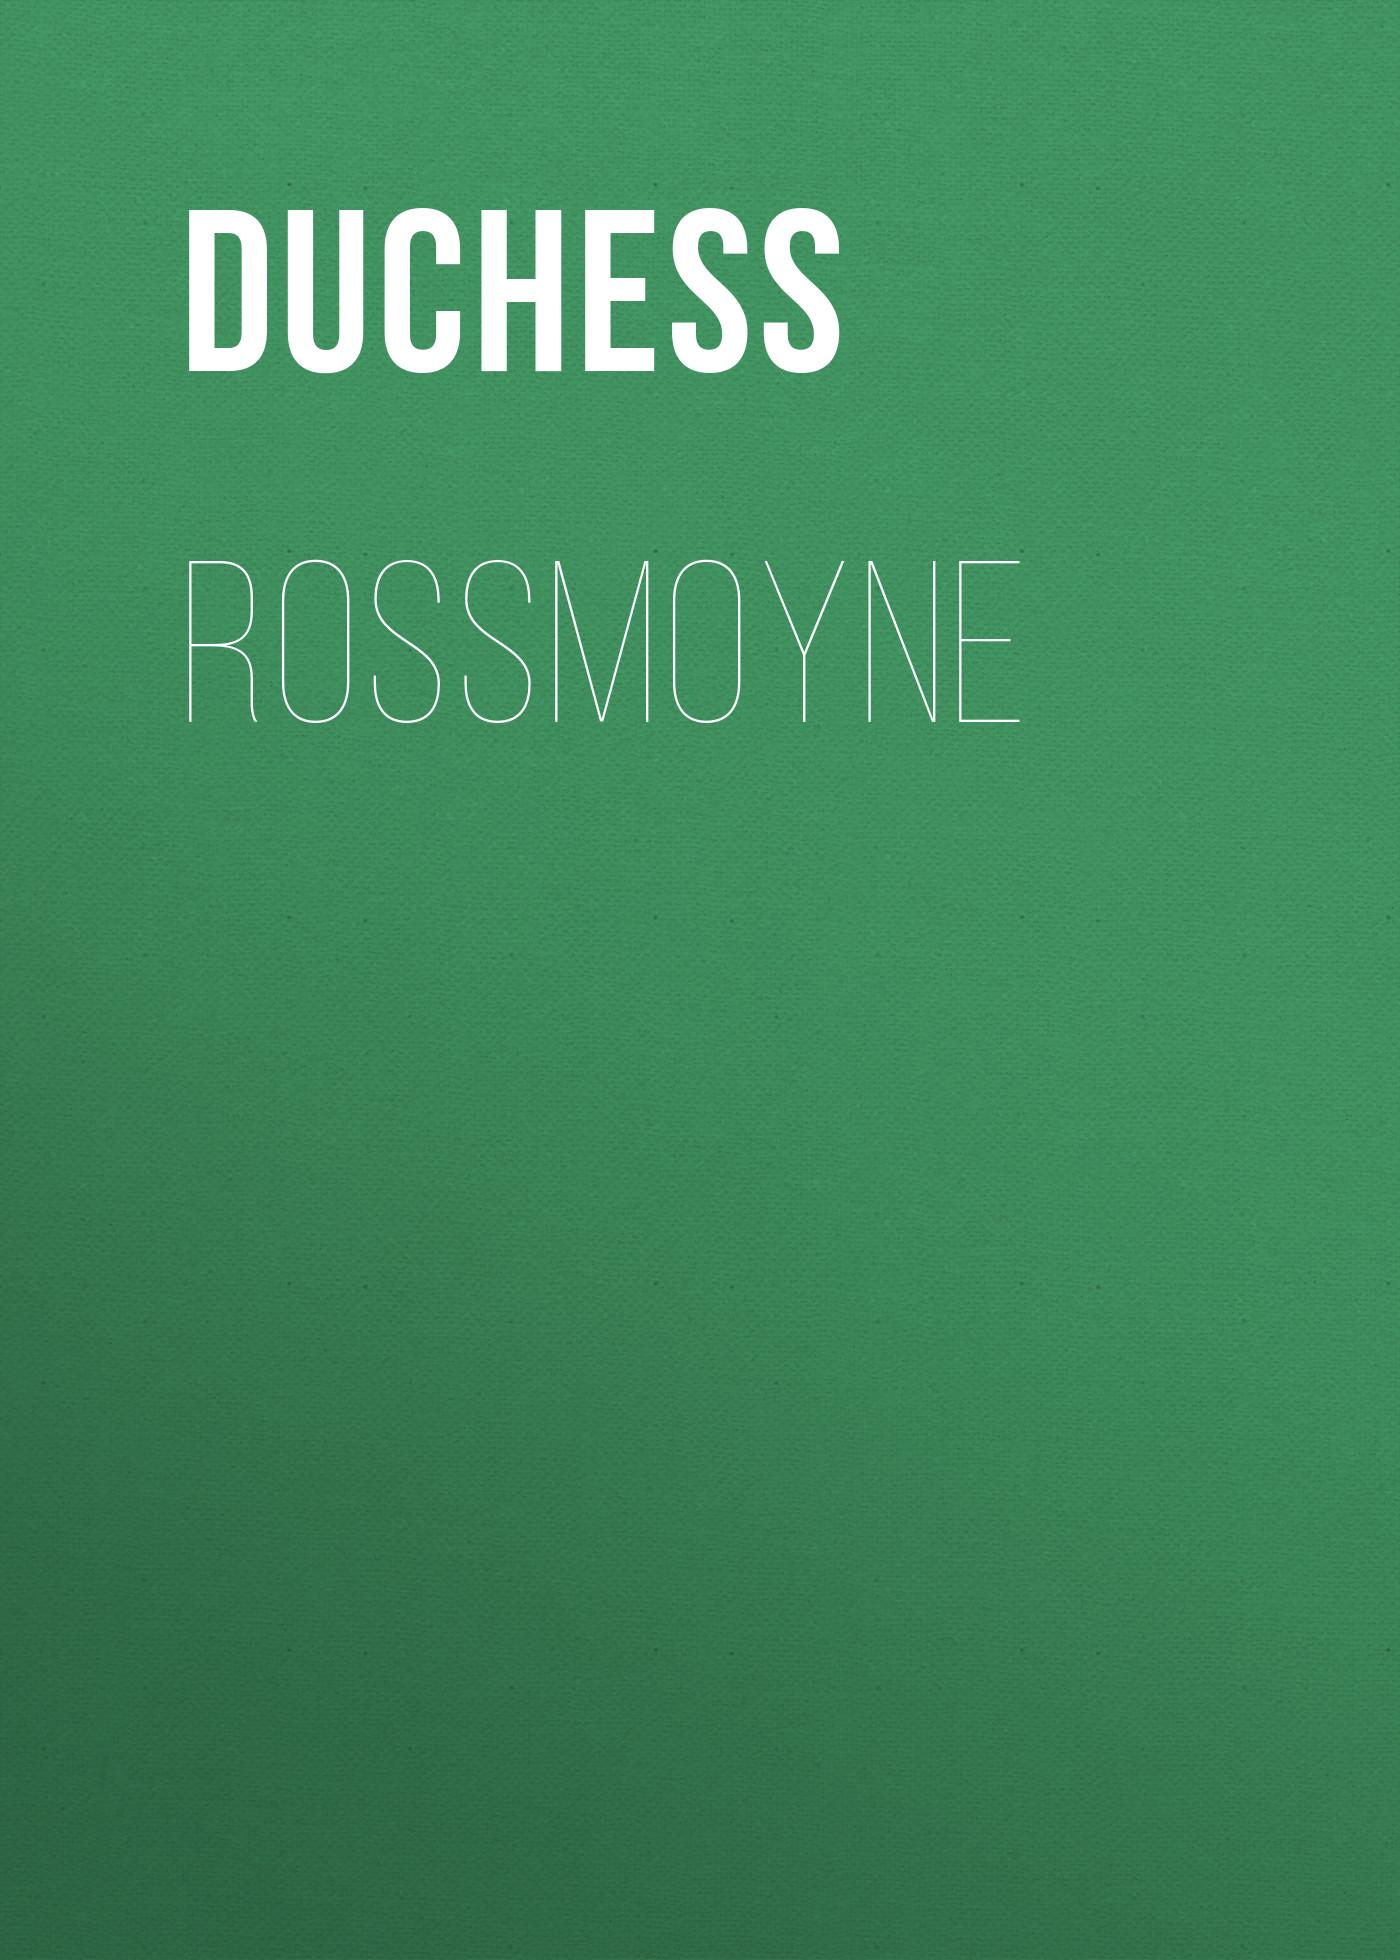 Duchess Rossmoyne duchess mrs geoffrey